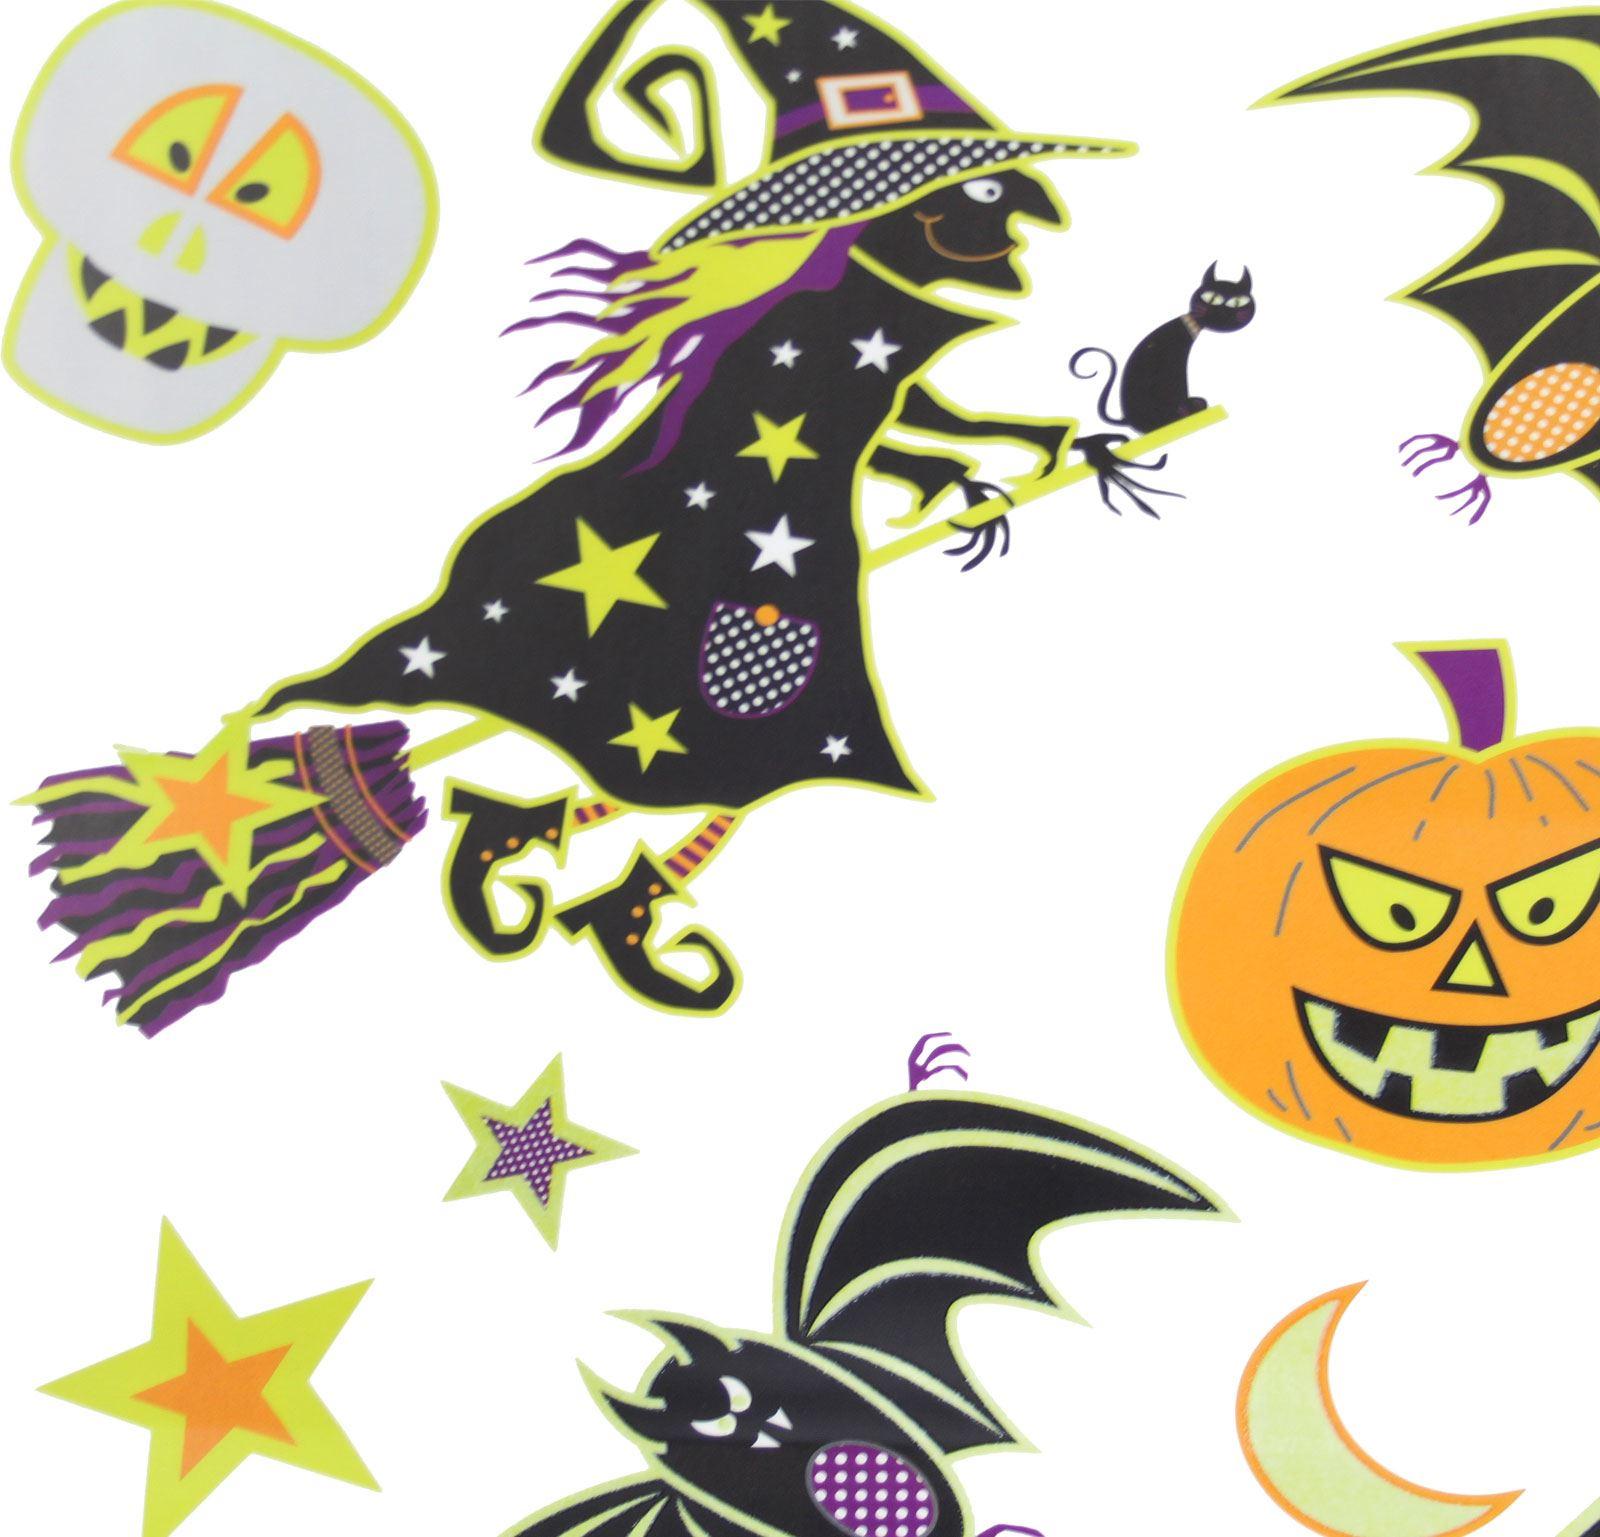 Halloween Spooky Scary Vinyl Glow Dark Stickers Room